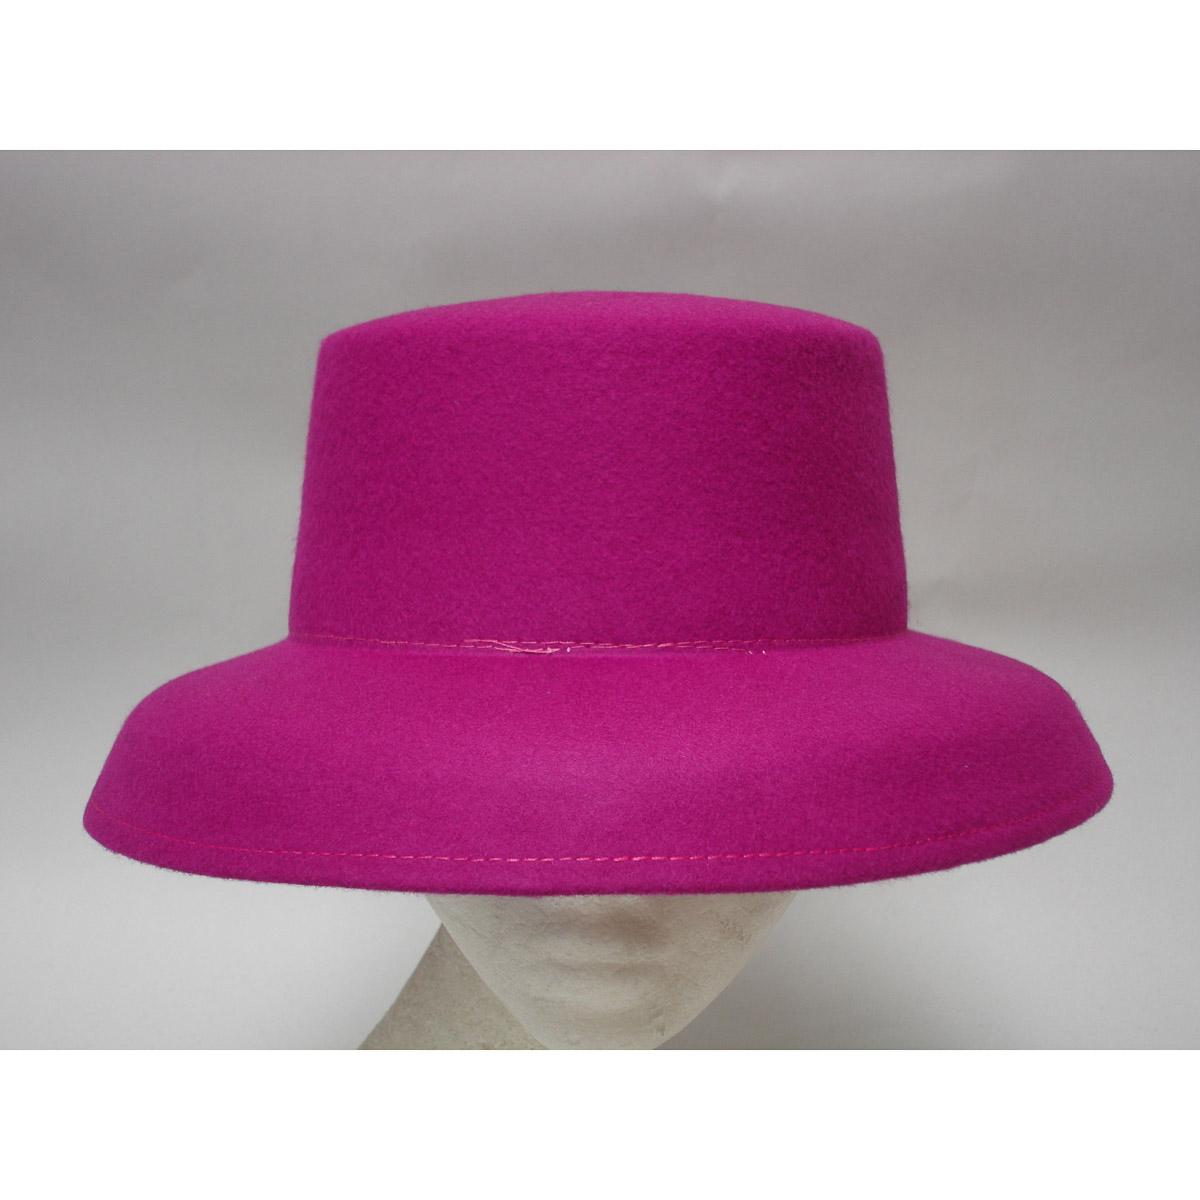 Fuchsia Down Kettle Brim Dome Shape Blocked Untrimmed Felt Hat Base